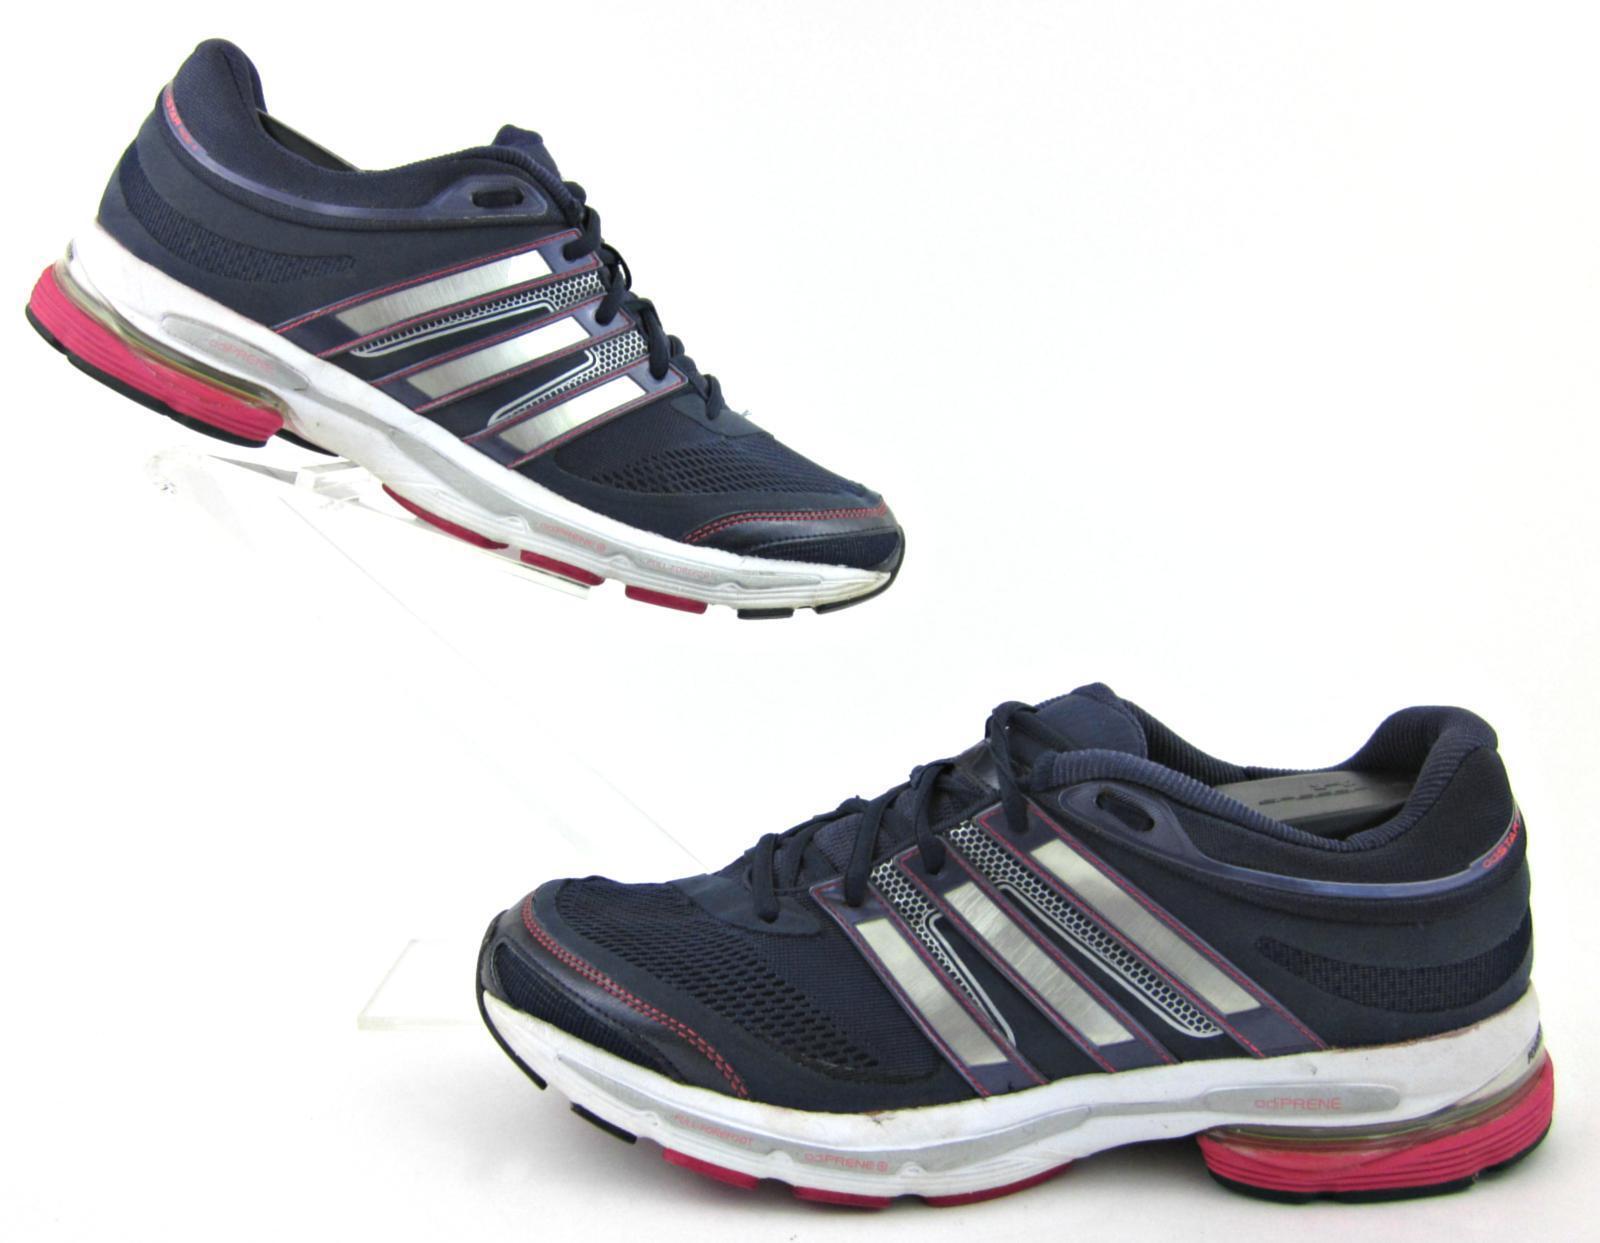 Adidas Adistar Ride 4 Womens Running Shoes Navy Silver US 12 Fantastic!